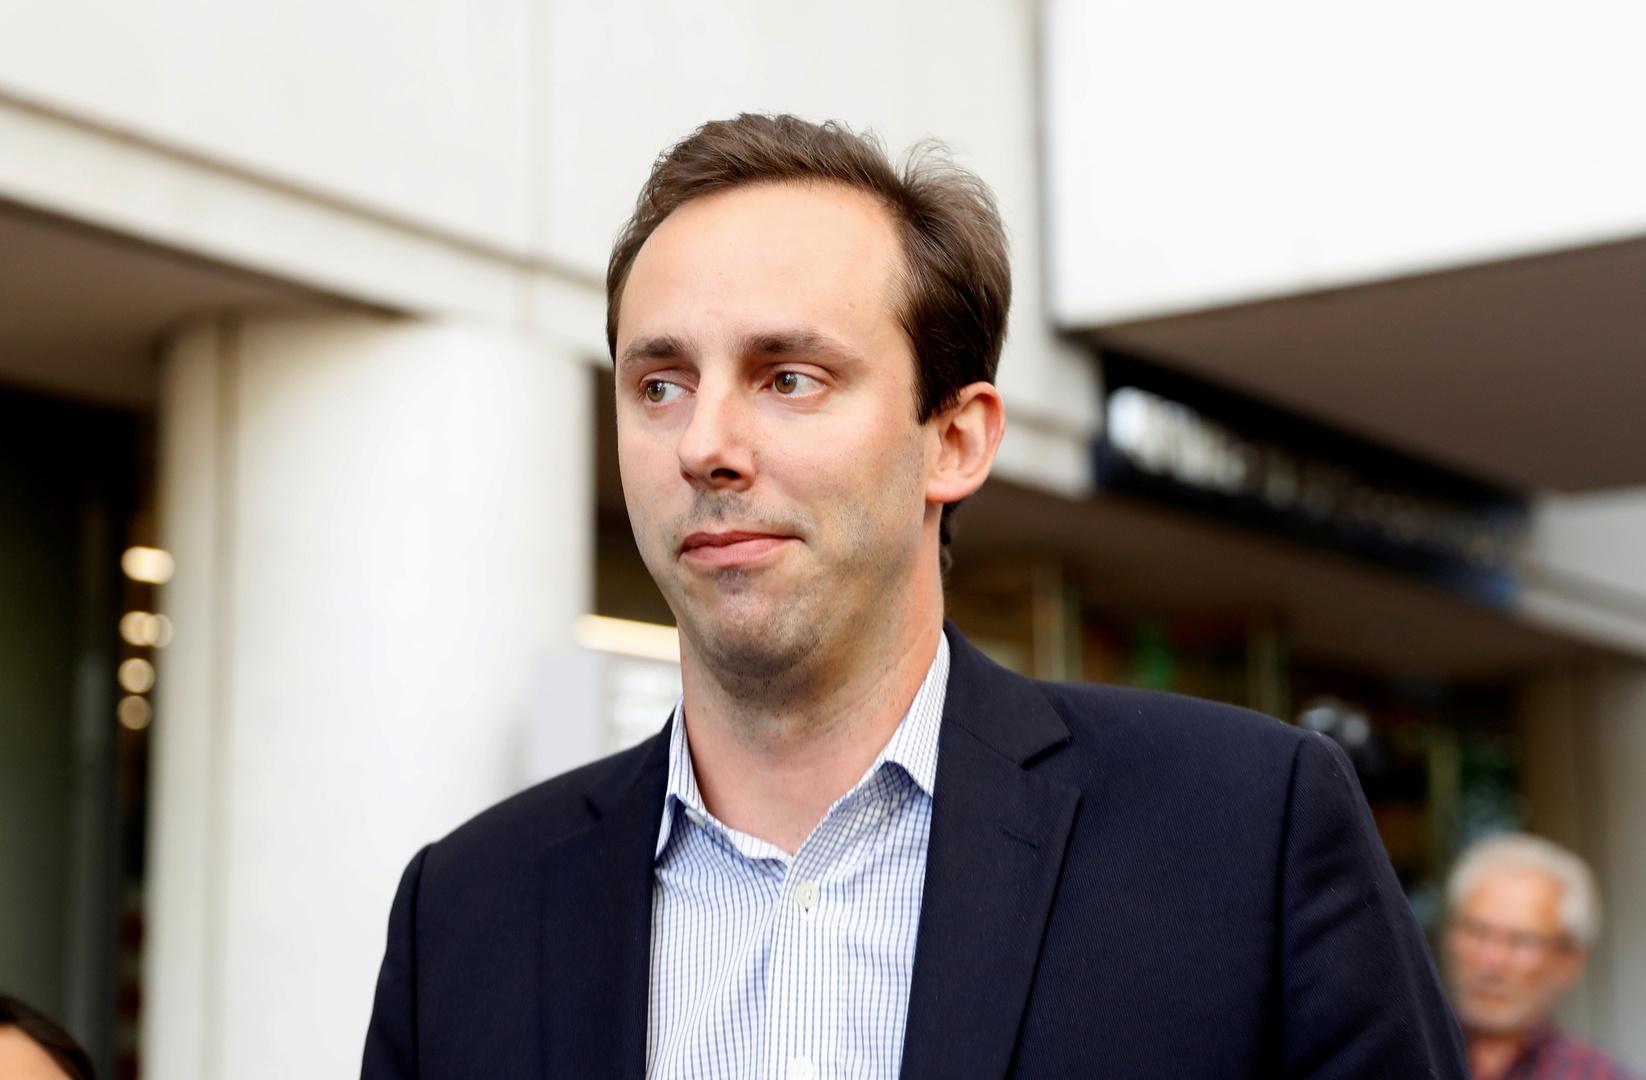 مهندس غوغل السابق Anthony Levandowski